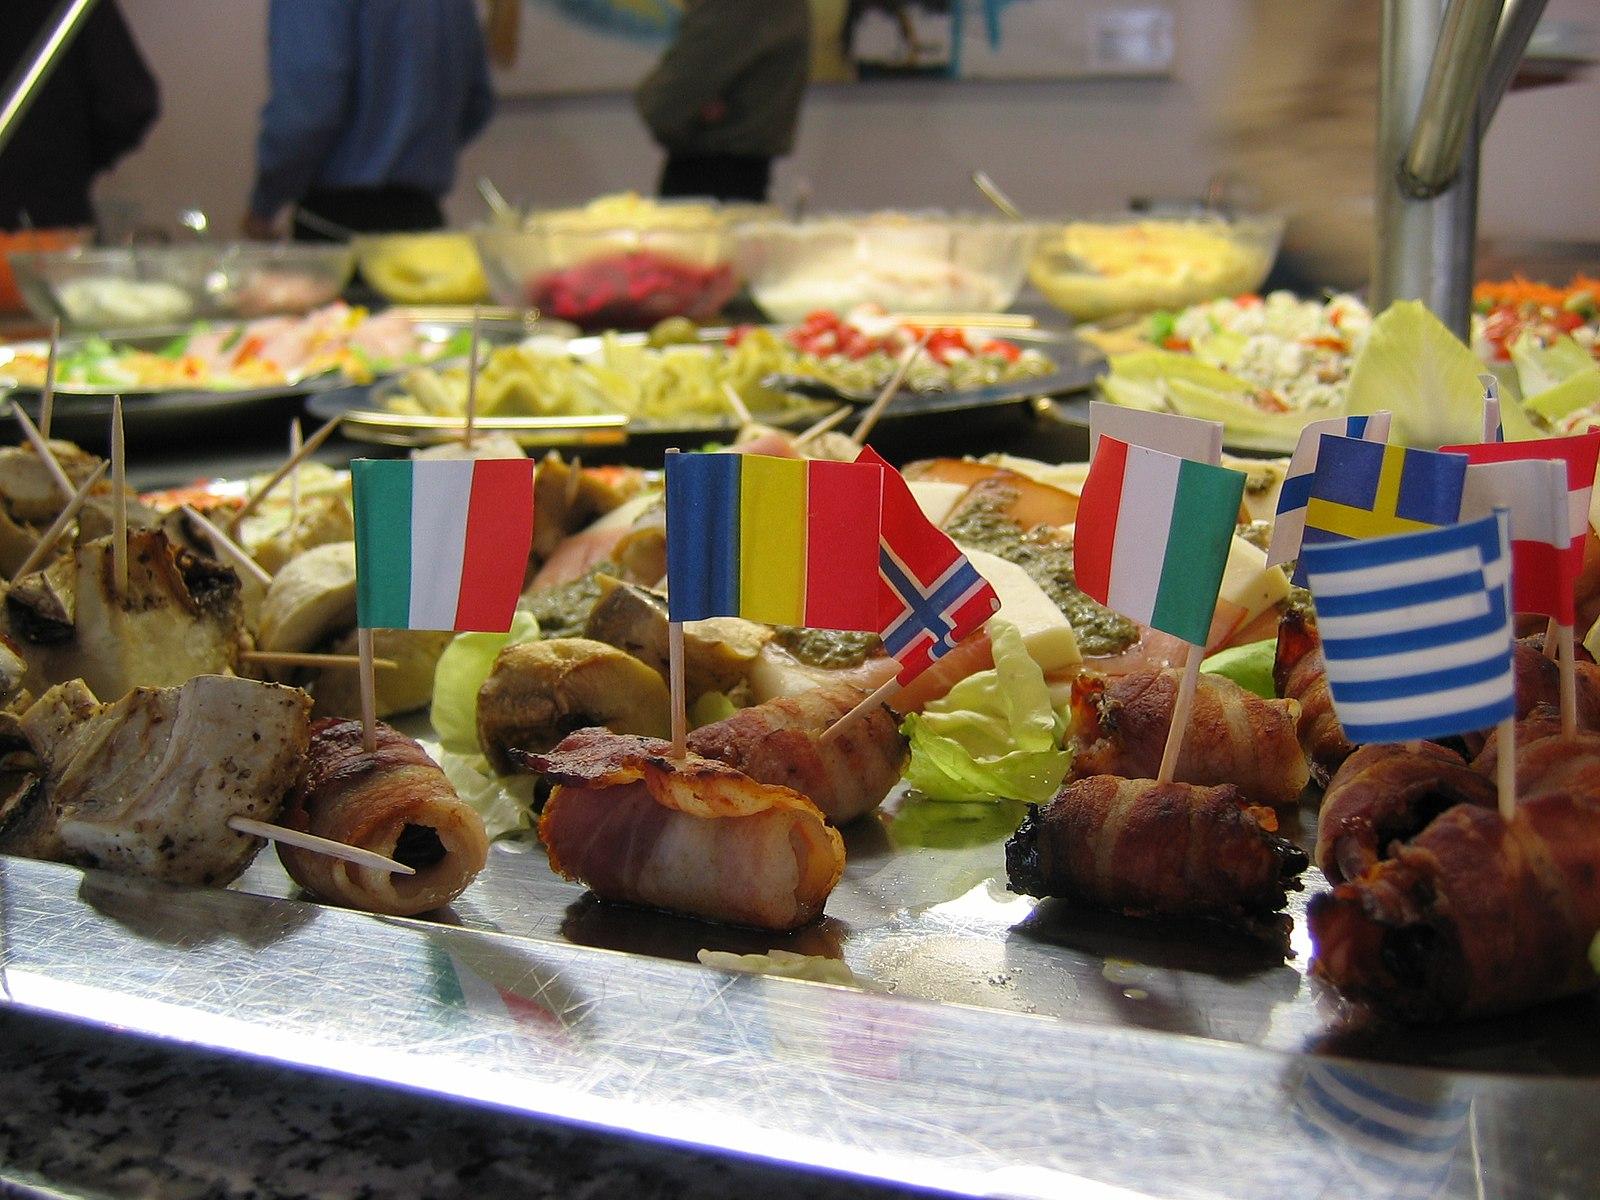 File:Nic McPhee - International cuisine.jpg